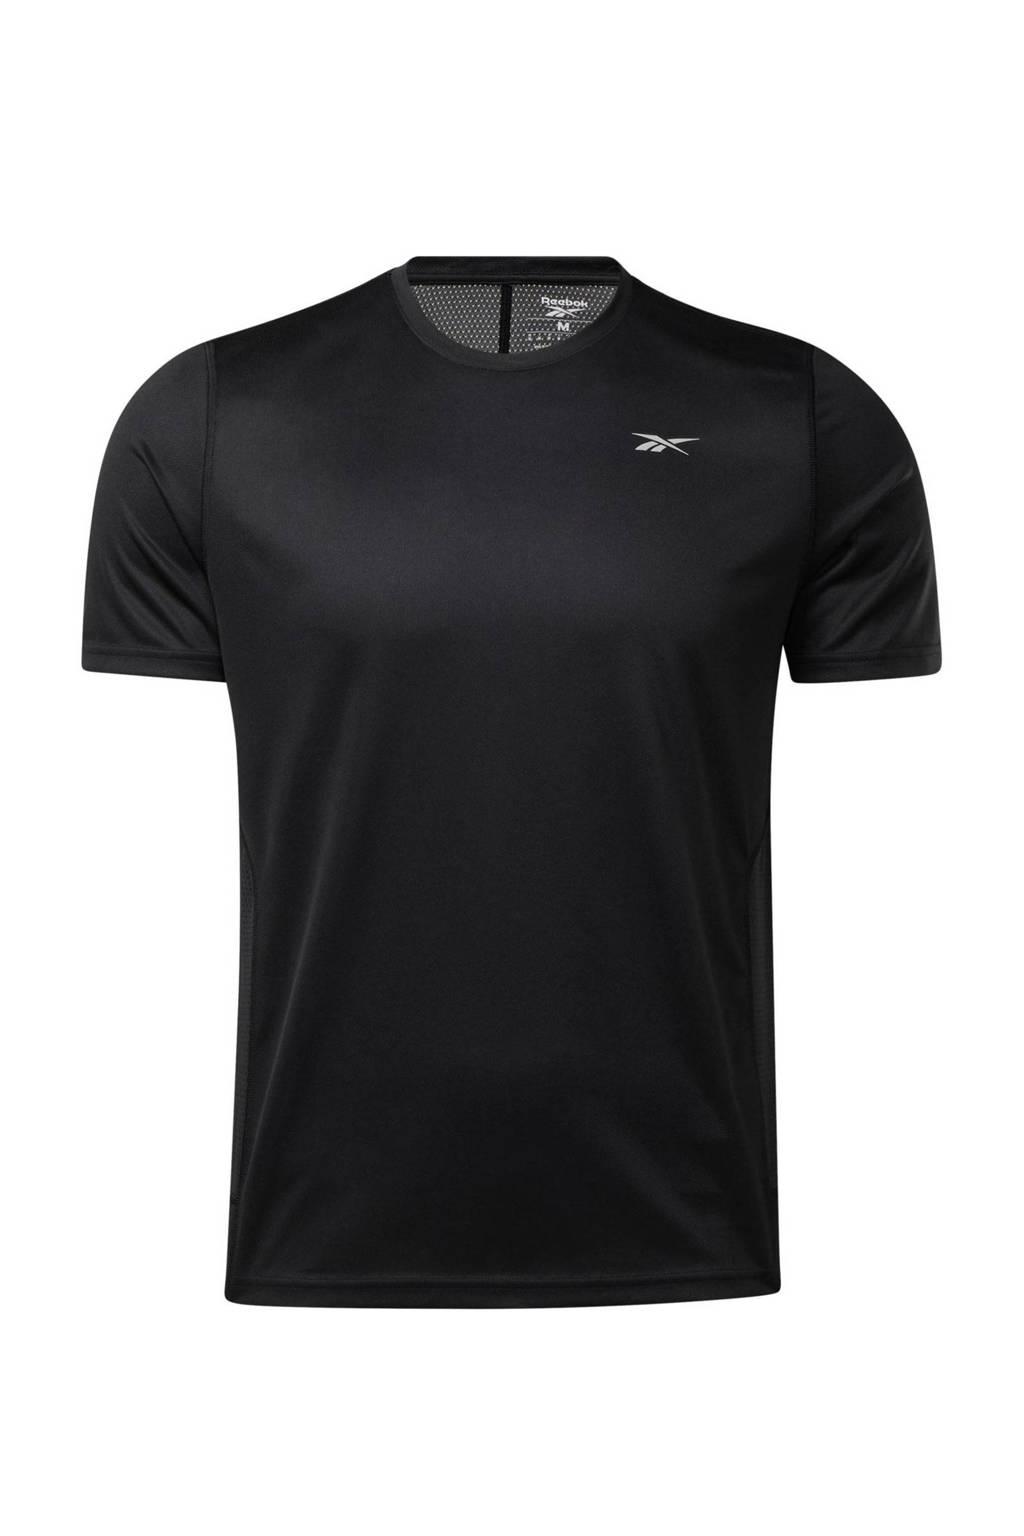 Reebok Training   hardloopshirt zwart, Zwart